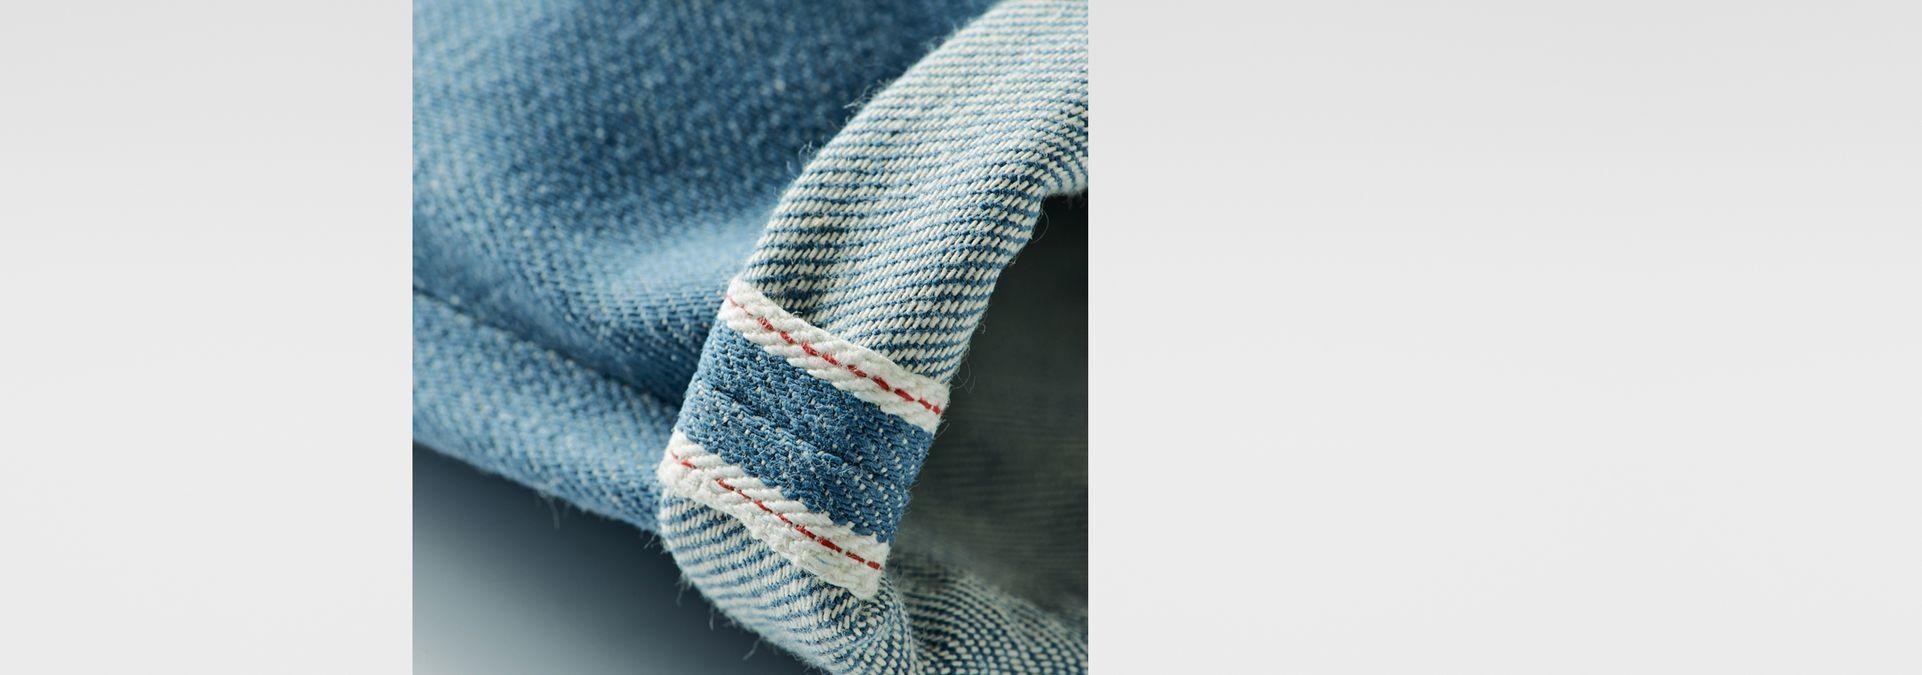 marc newson jeans raw denim men sale g star raw. Black Bedroom Furniture Sets. Home Design Ideas